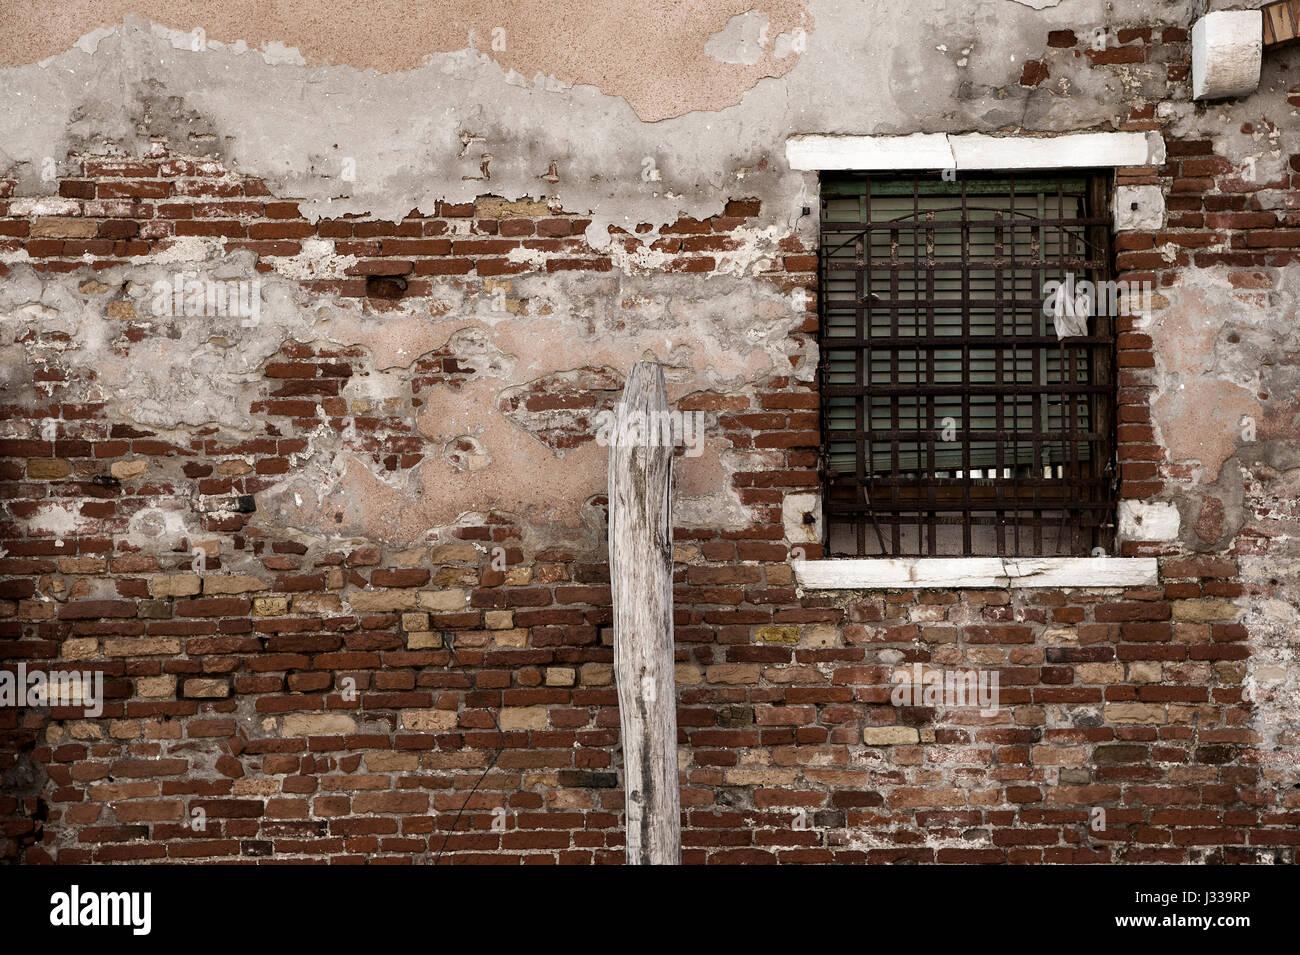 A window on a grunge wall of brick Stock Photo